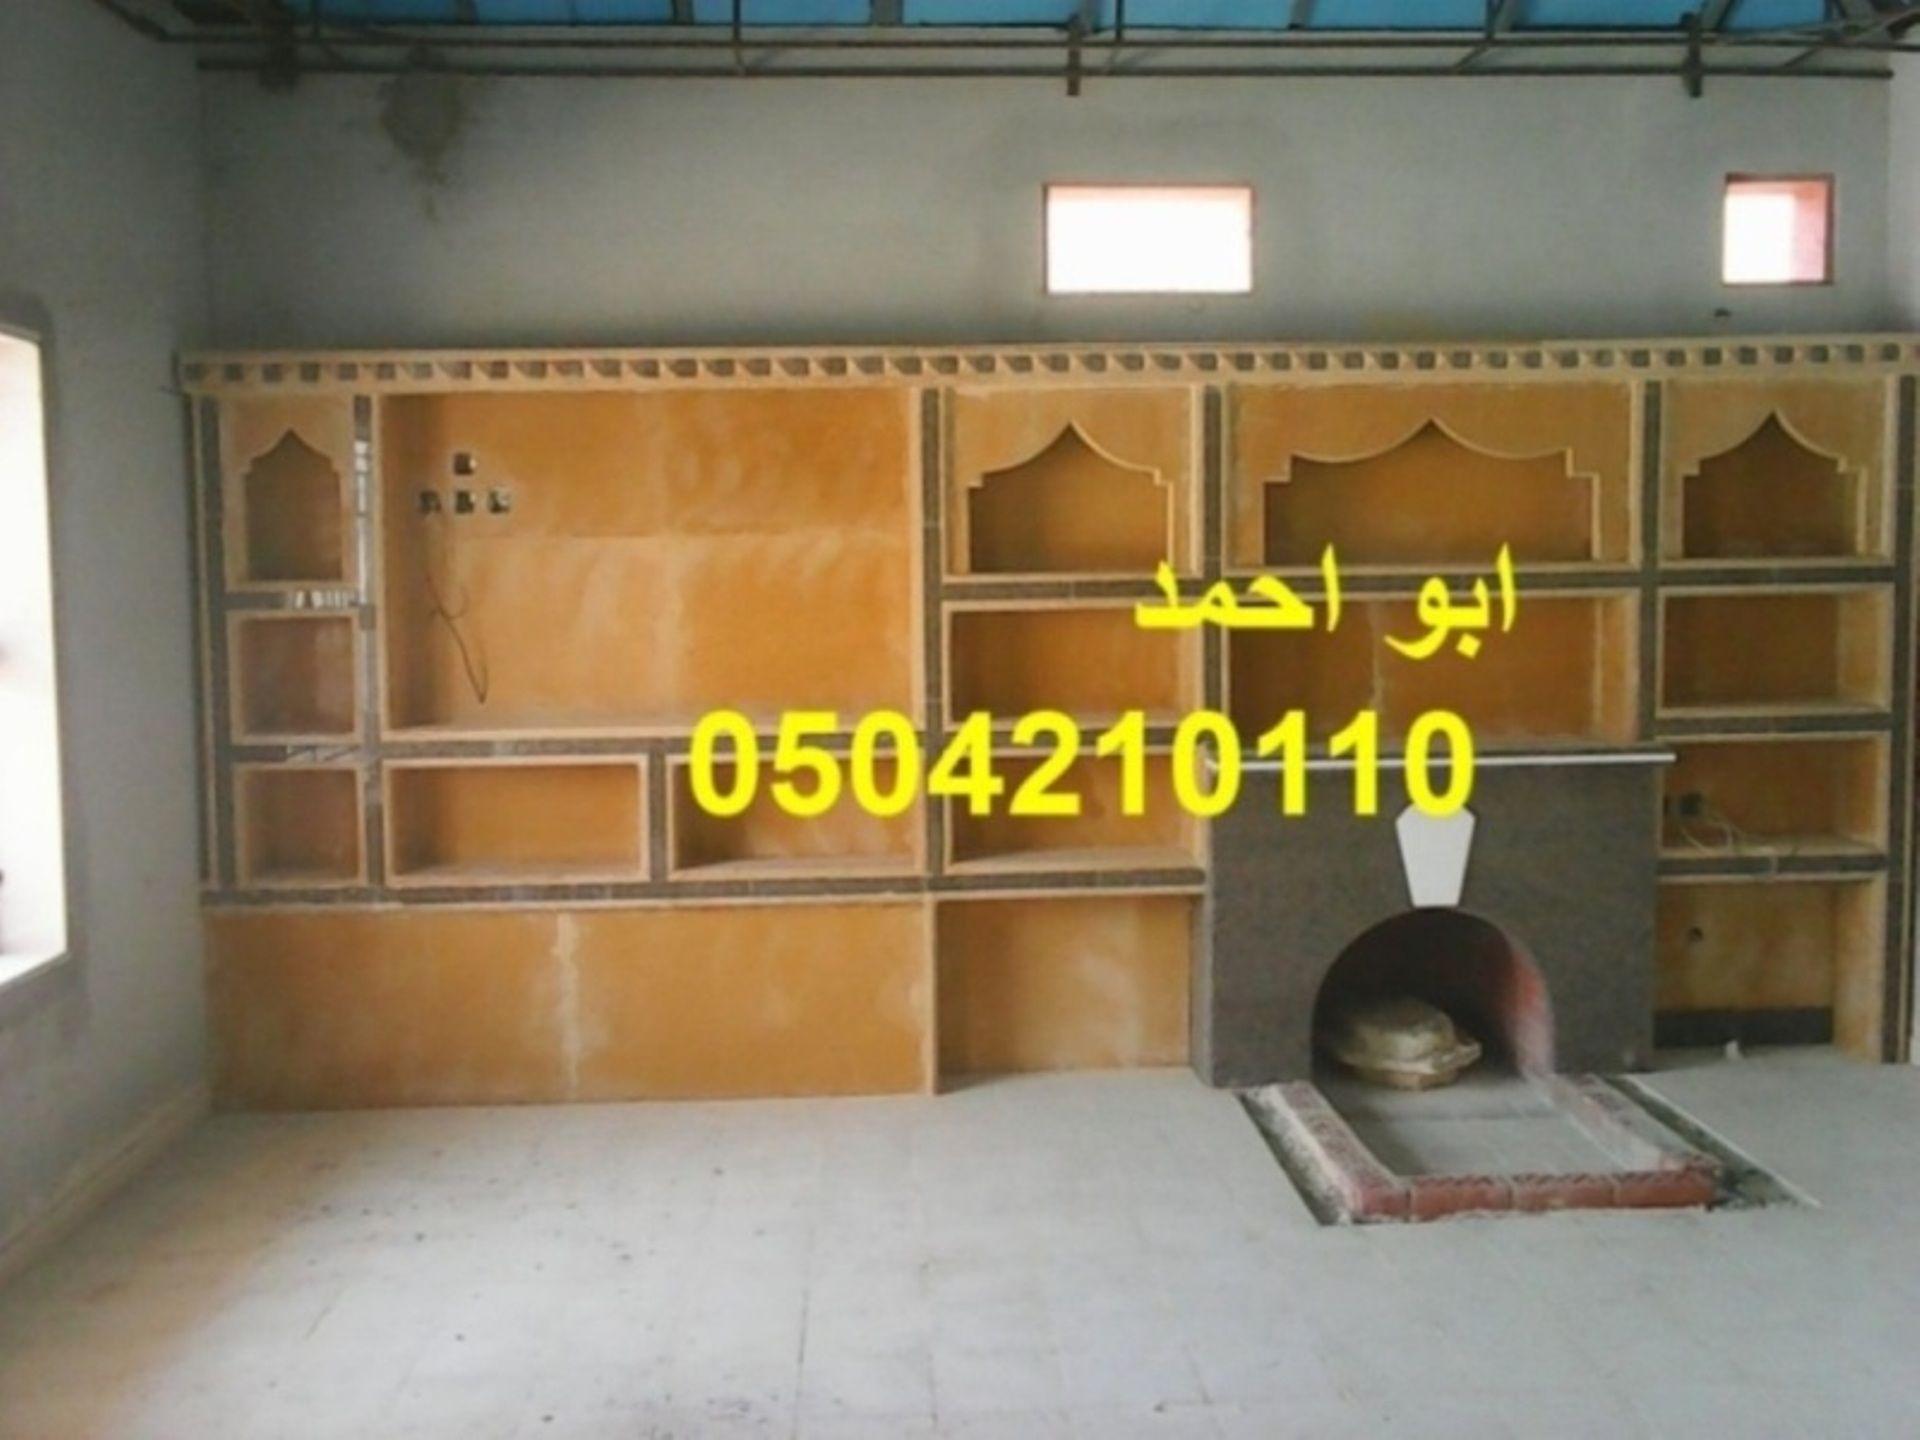 مشبات مجالس صور مشبات قصور مشبات بقعاء مشبات الرياض مشبات جدة مشبات مكة ديكور مشب حجر حديث مشبات فخمه مشبات روعه مشبا Craftsman Door Remodel Home Decor Decals